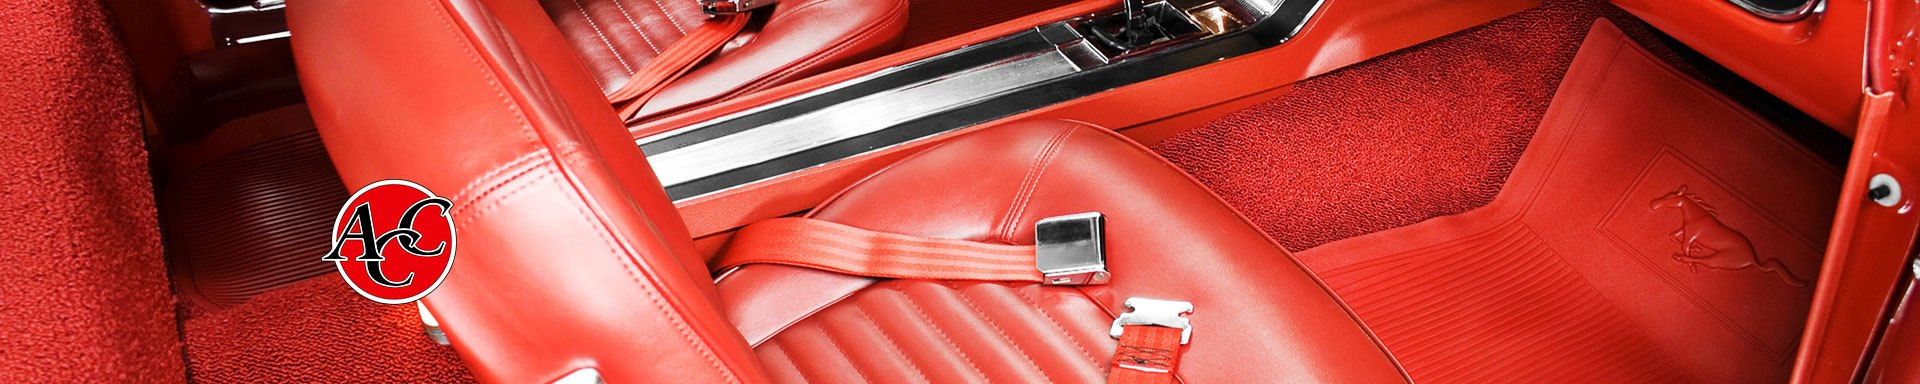 Auto Custom Carpets 17902-262-1277000000 Flooring